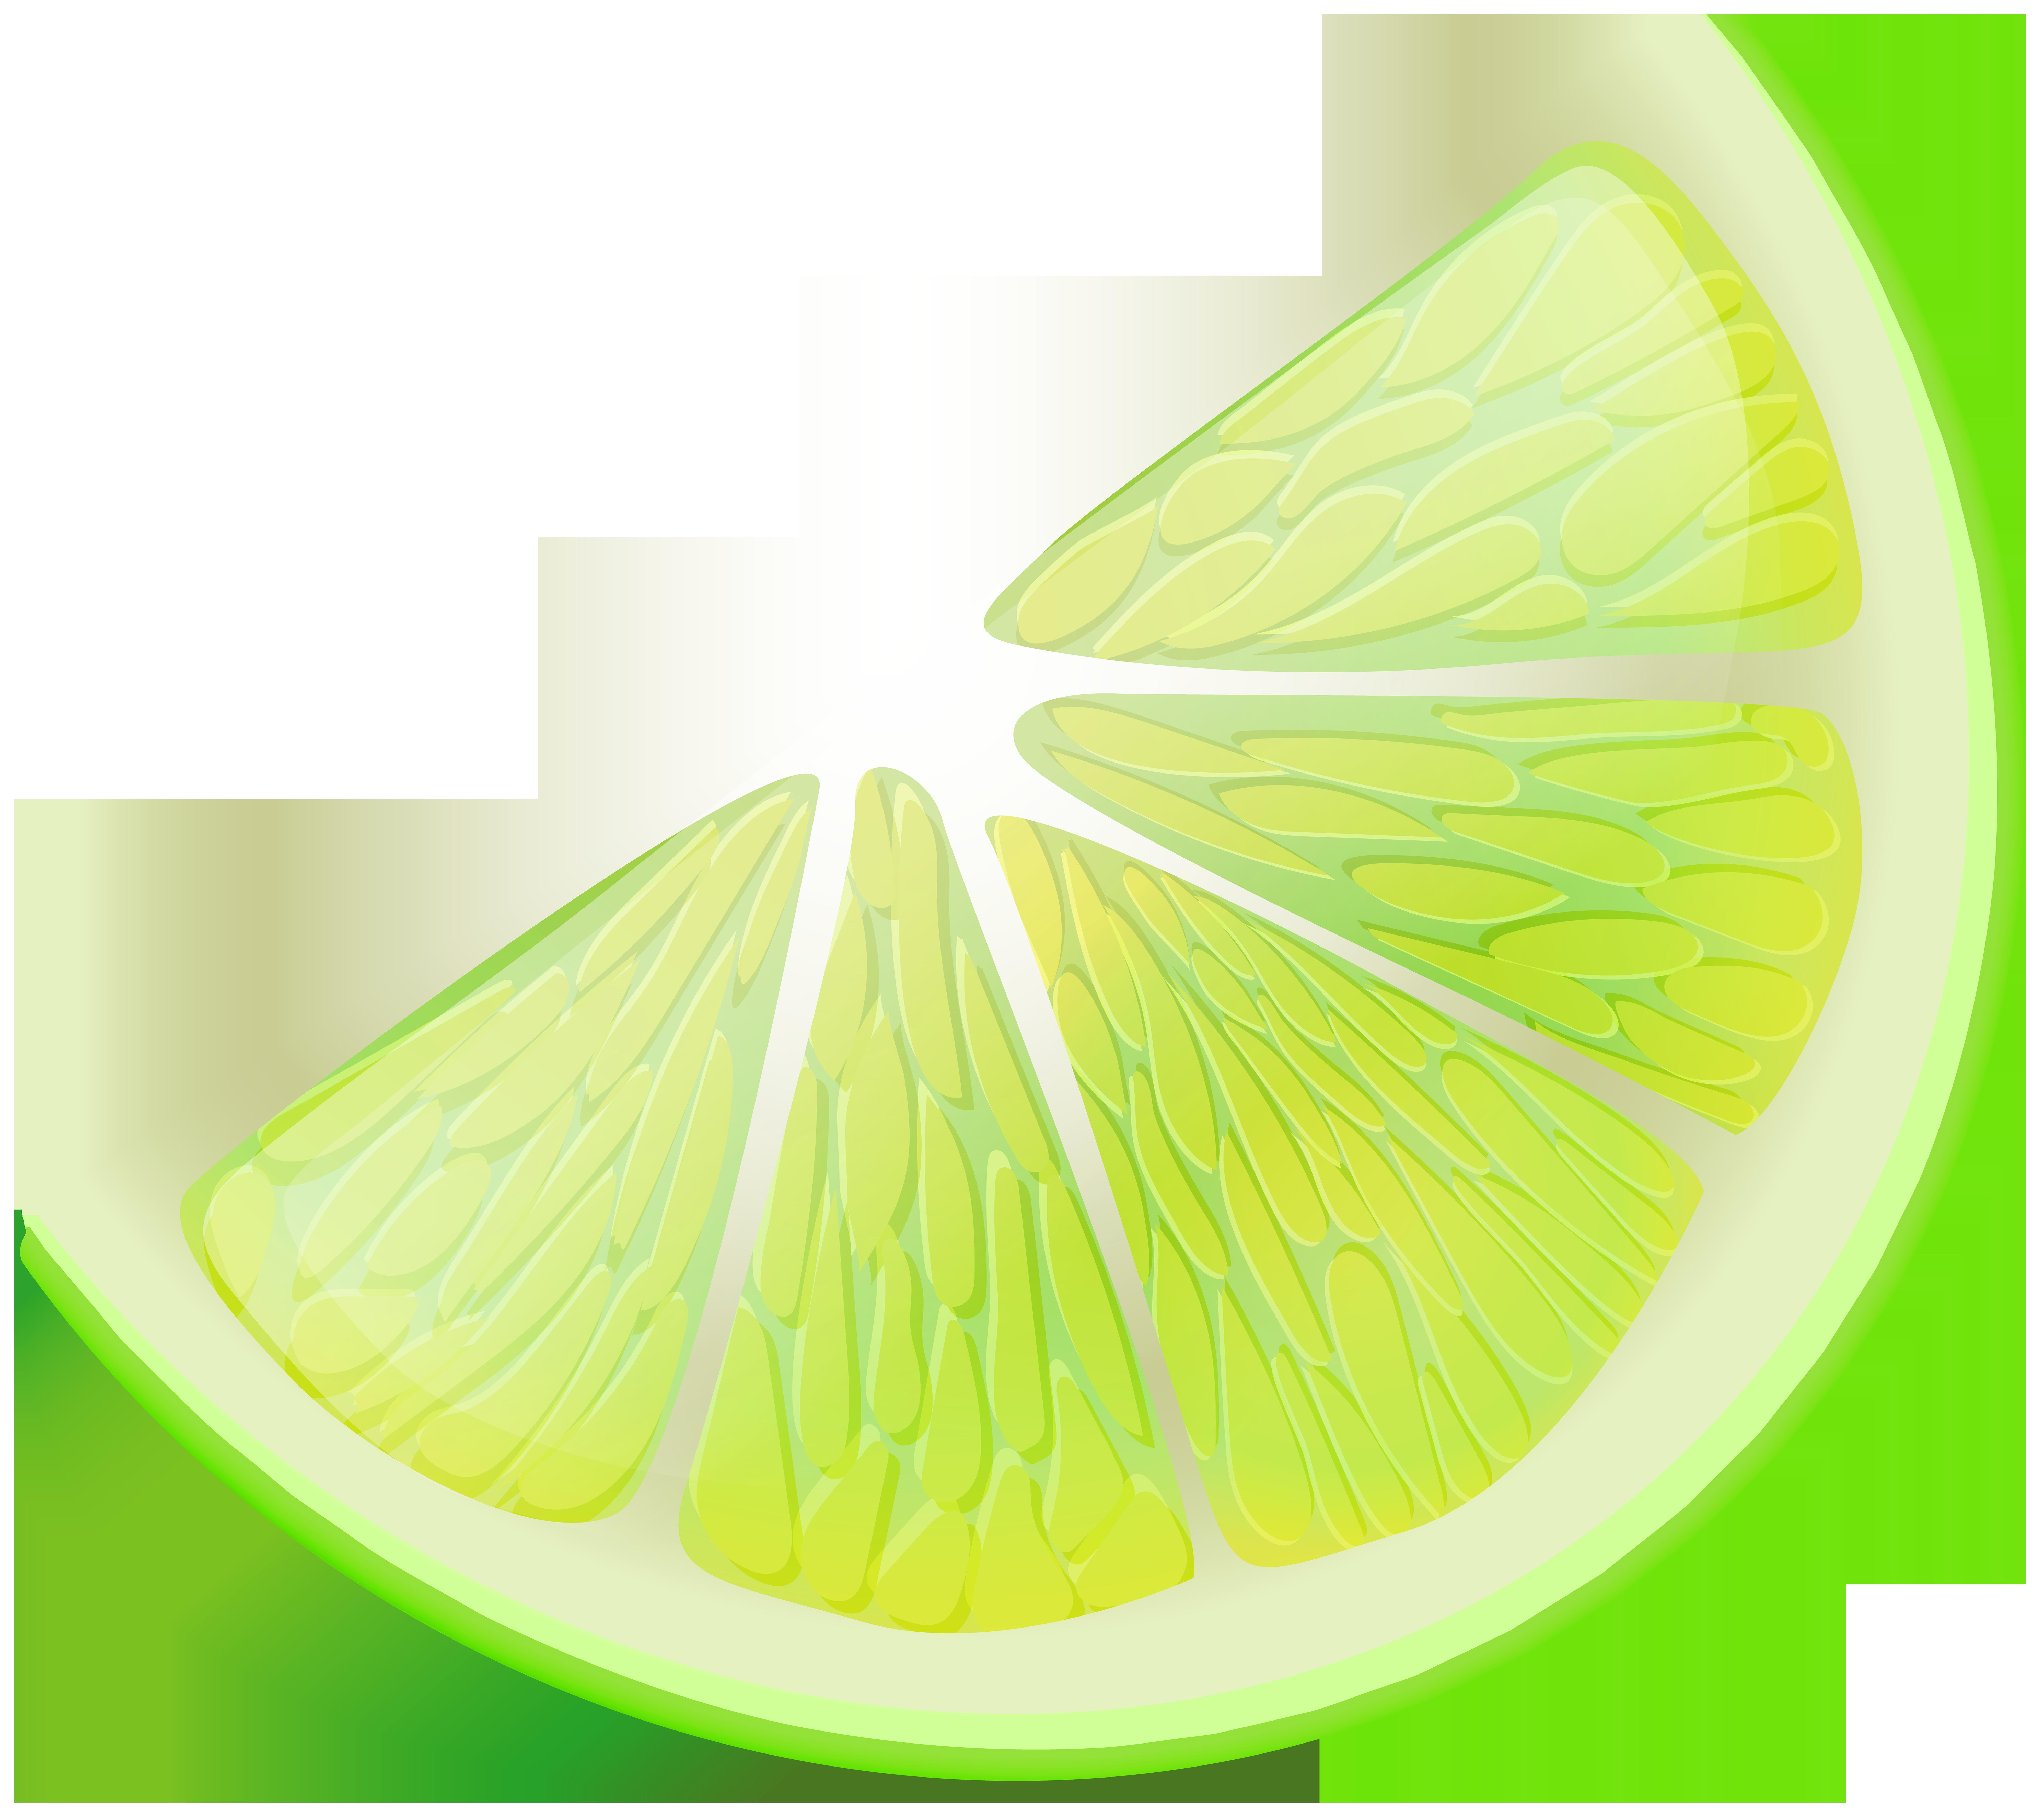 Lemon car clipart vector free library Lemon PNG Clip Art - Best WEB Clipart vector free library